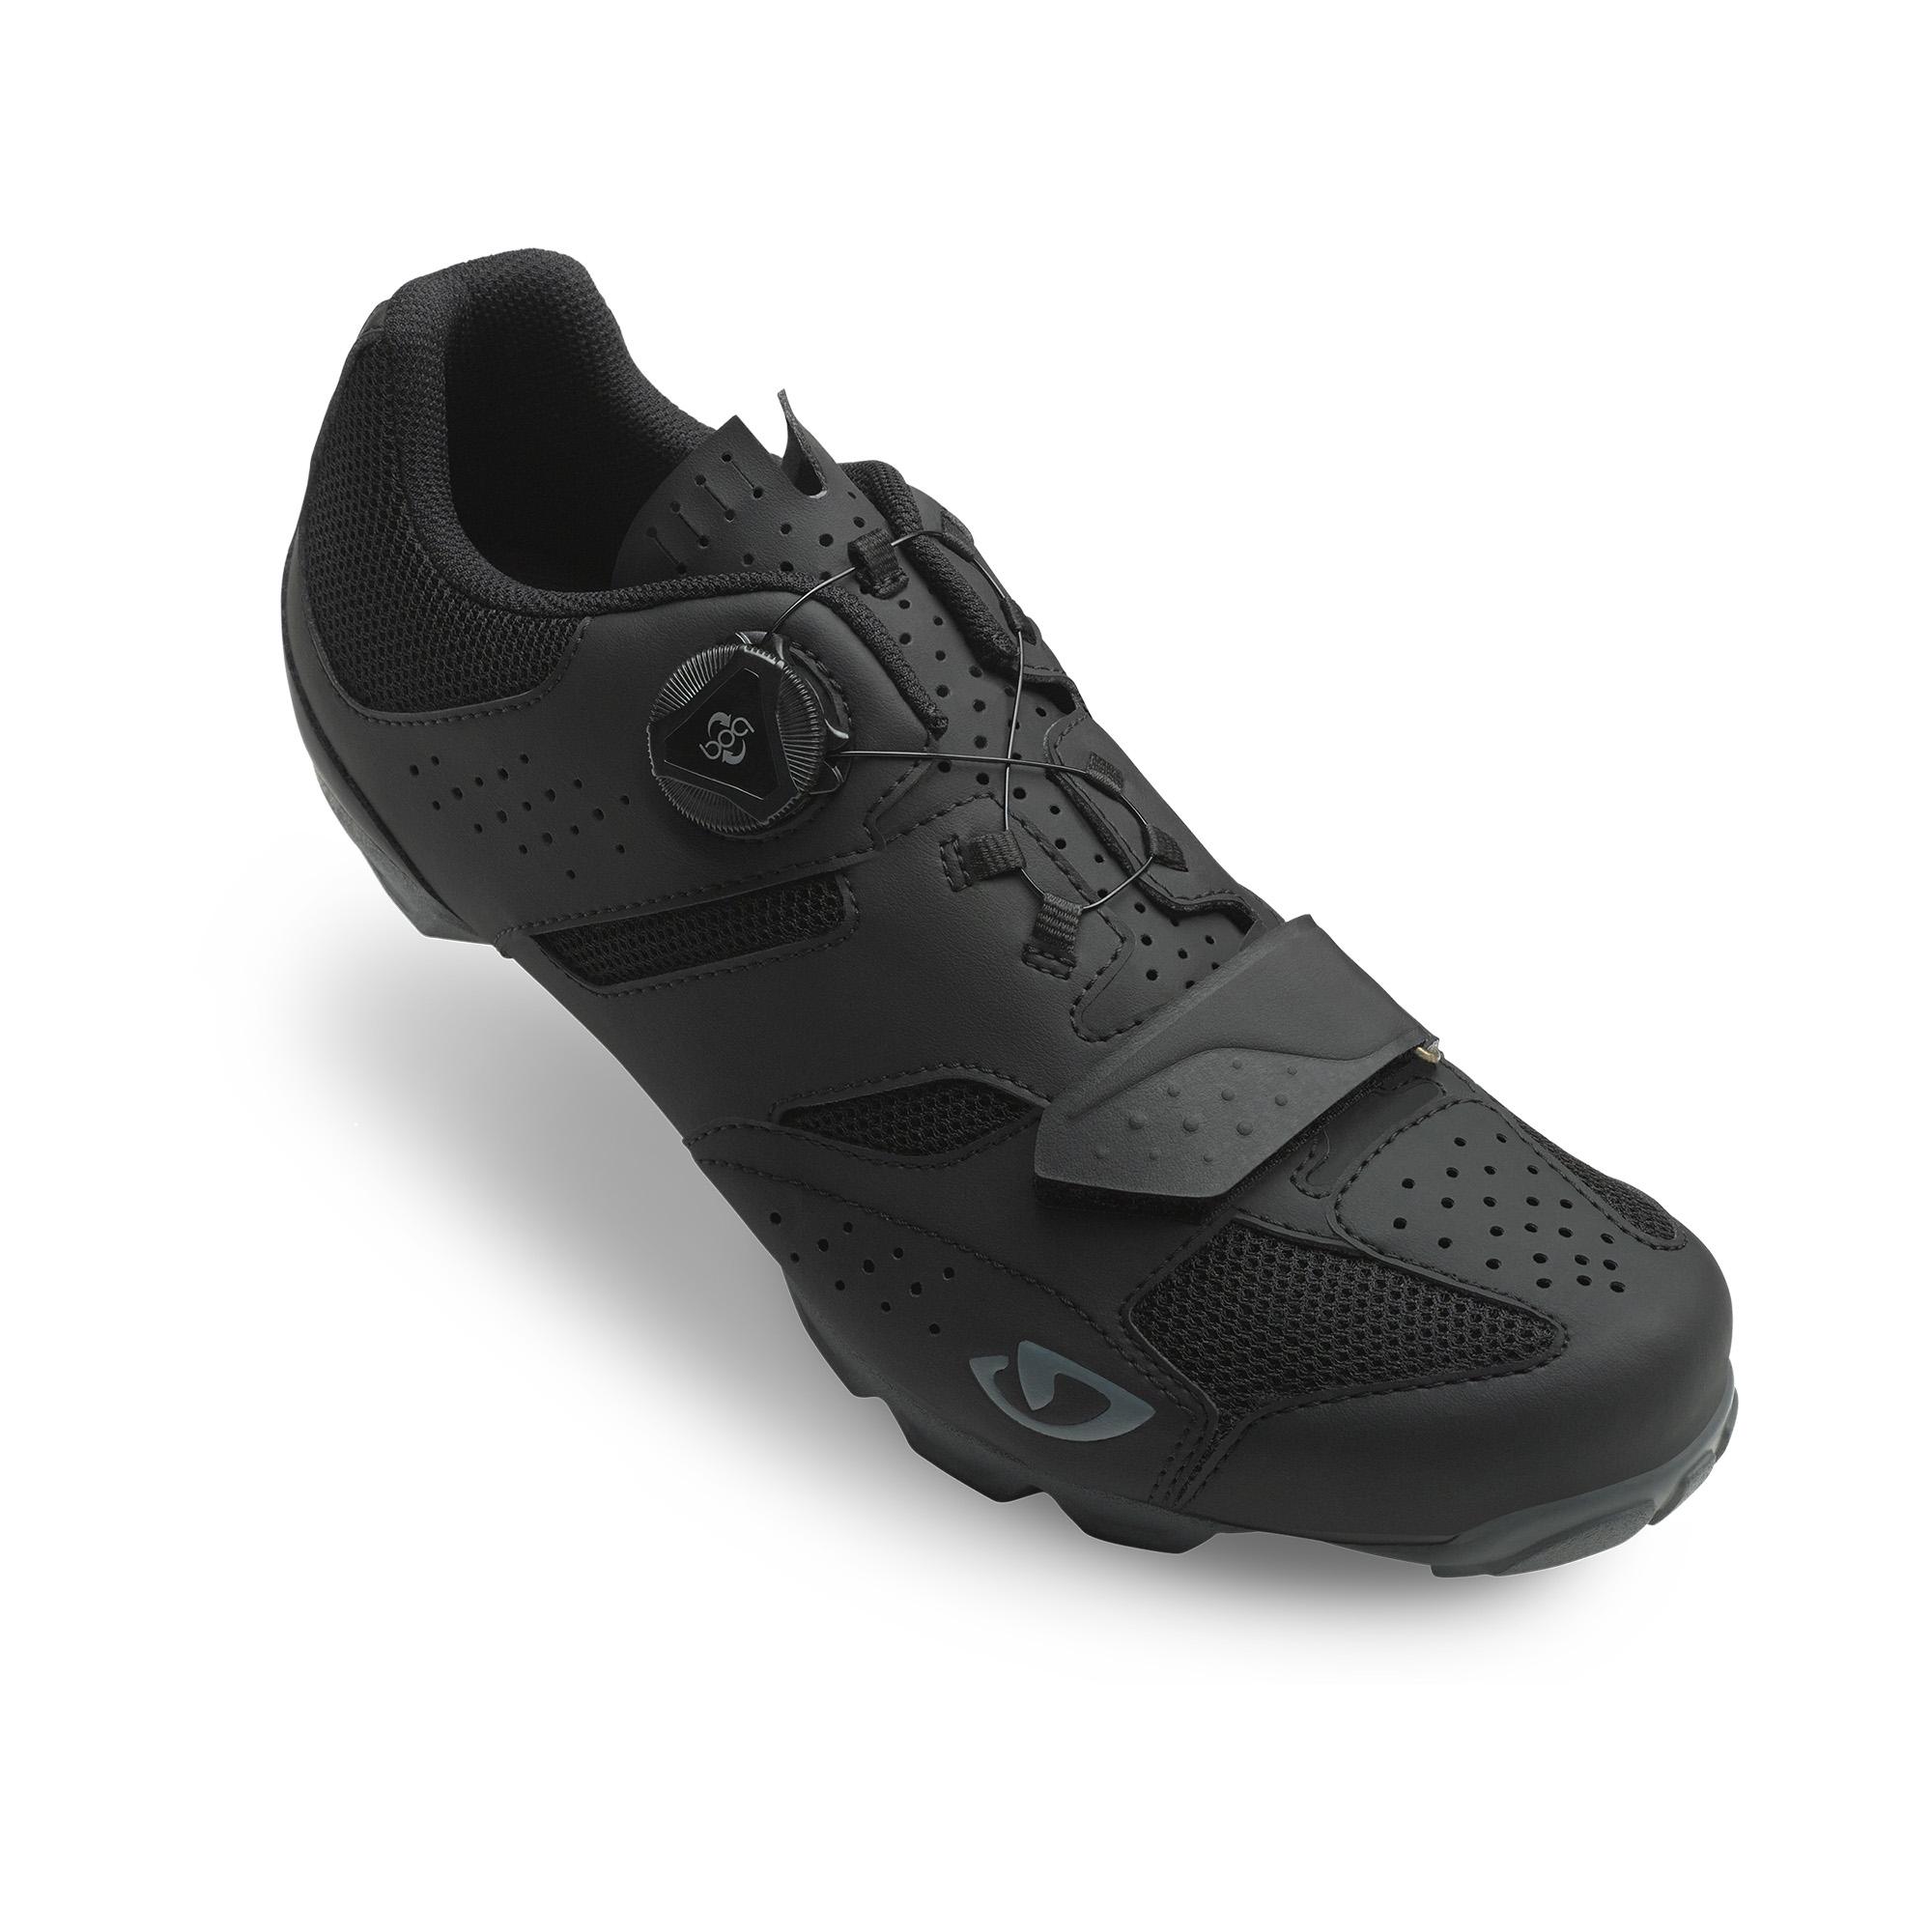 GIRO | CYLINDER HV+ MTB shoe